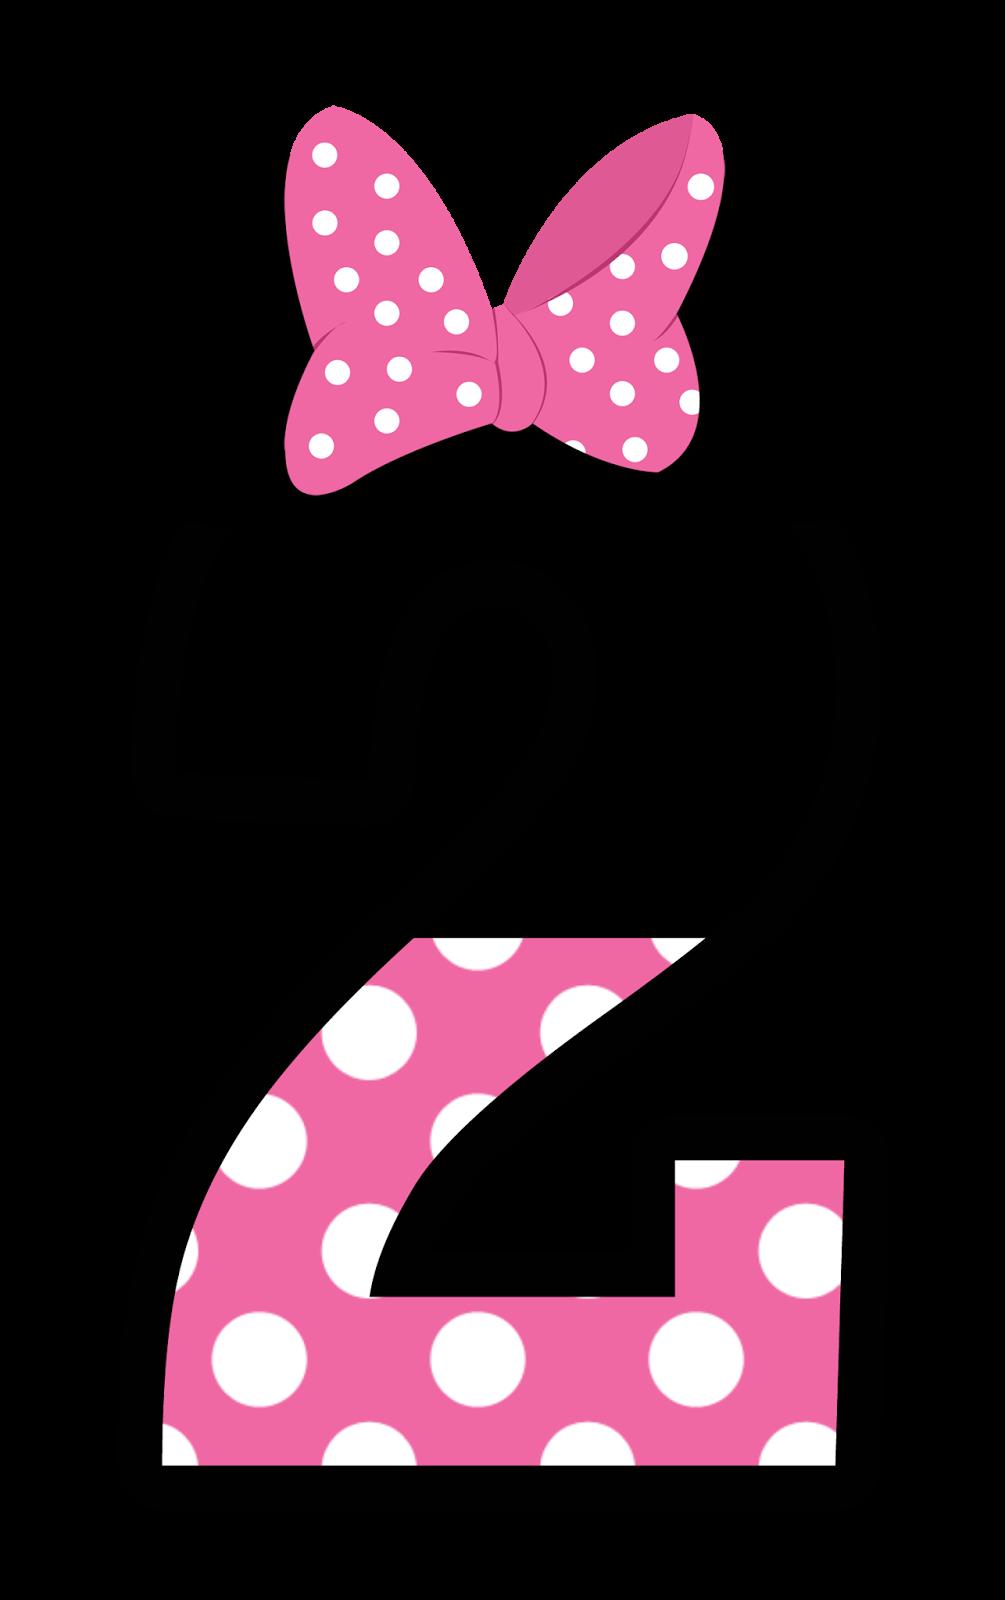 Küchendesign-logo joselaine quadros joselainequadros no pinterest